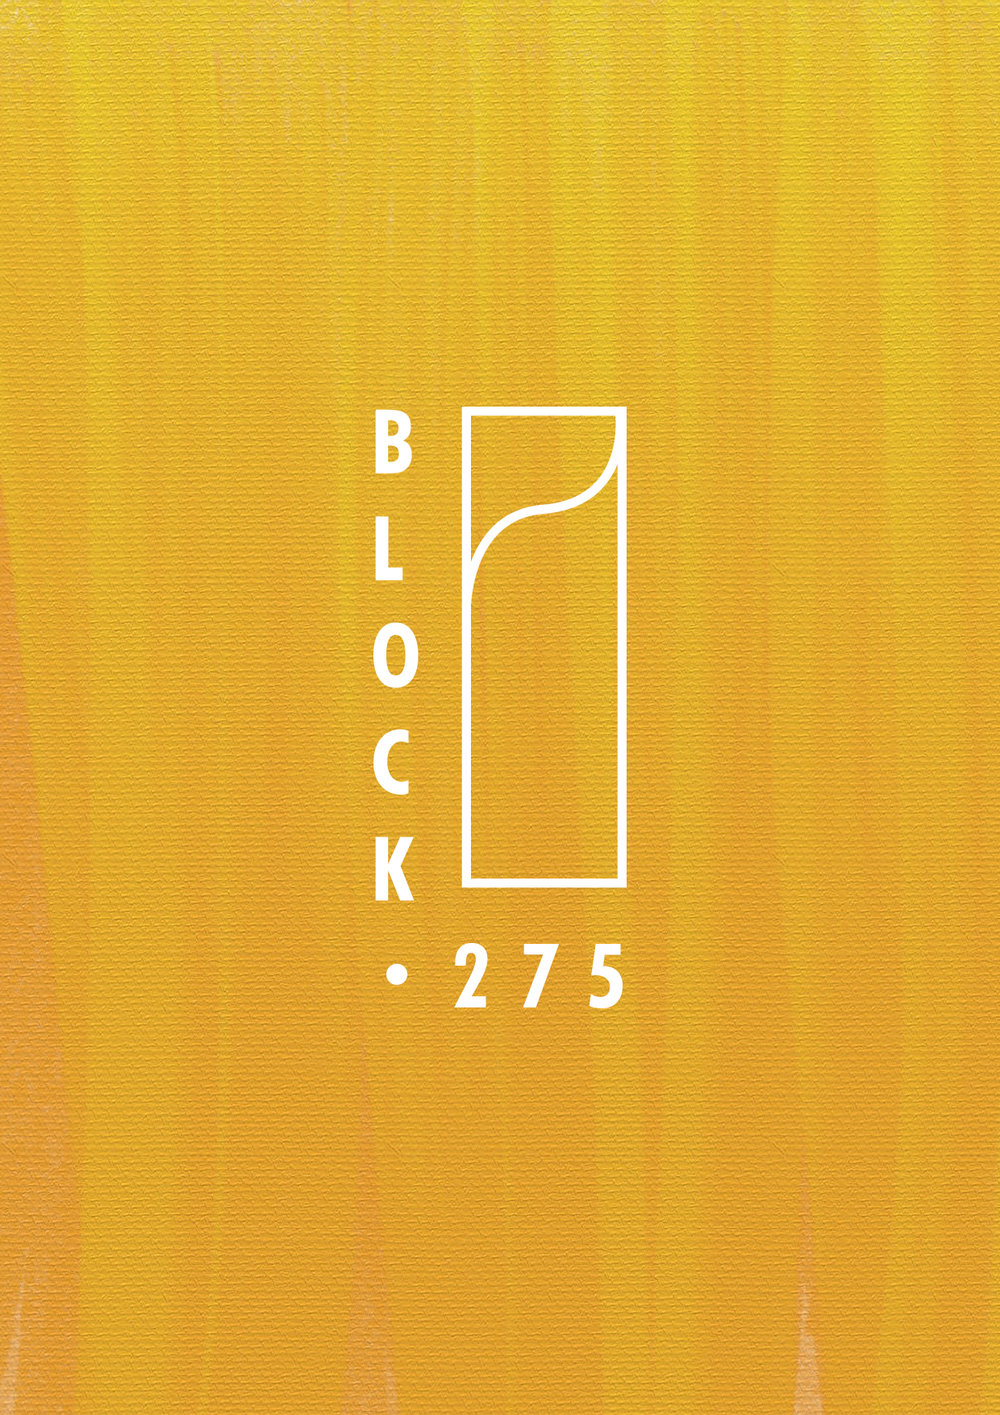 Block 275_Logo Concept 1 - 5.jpg